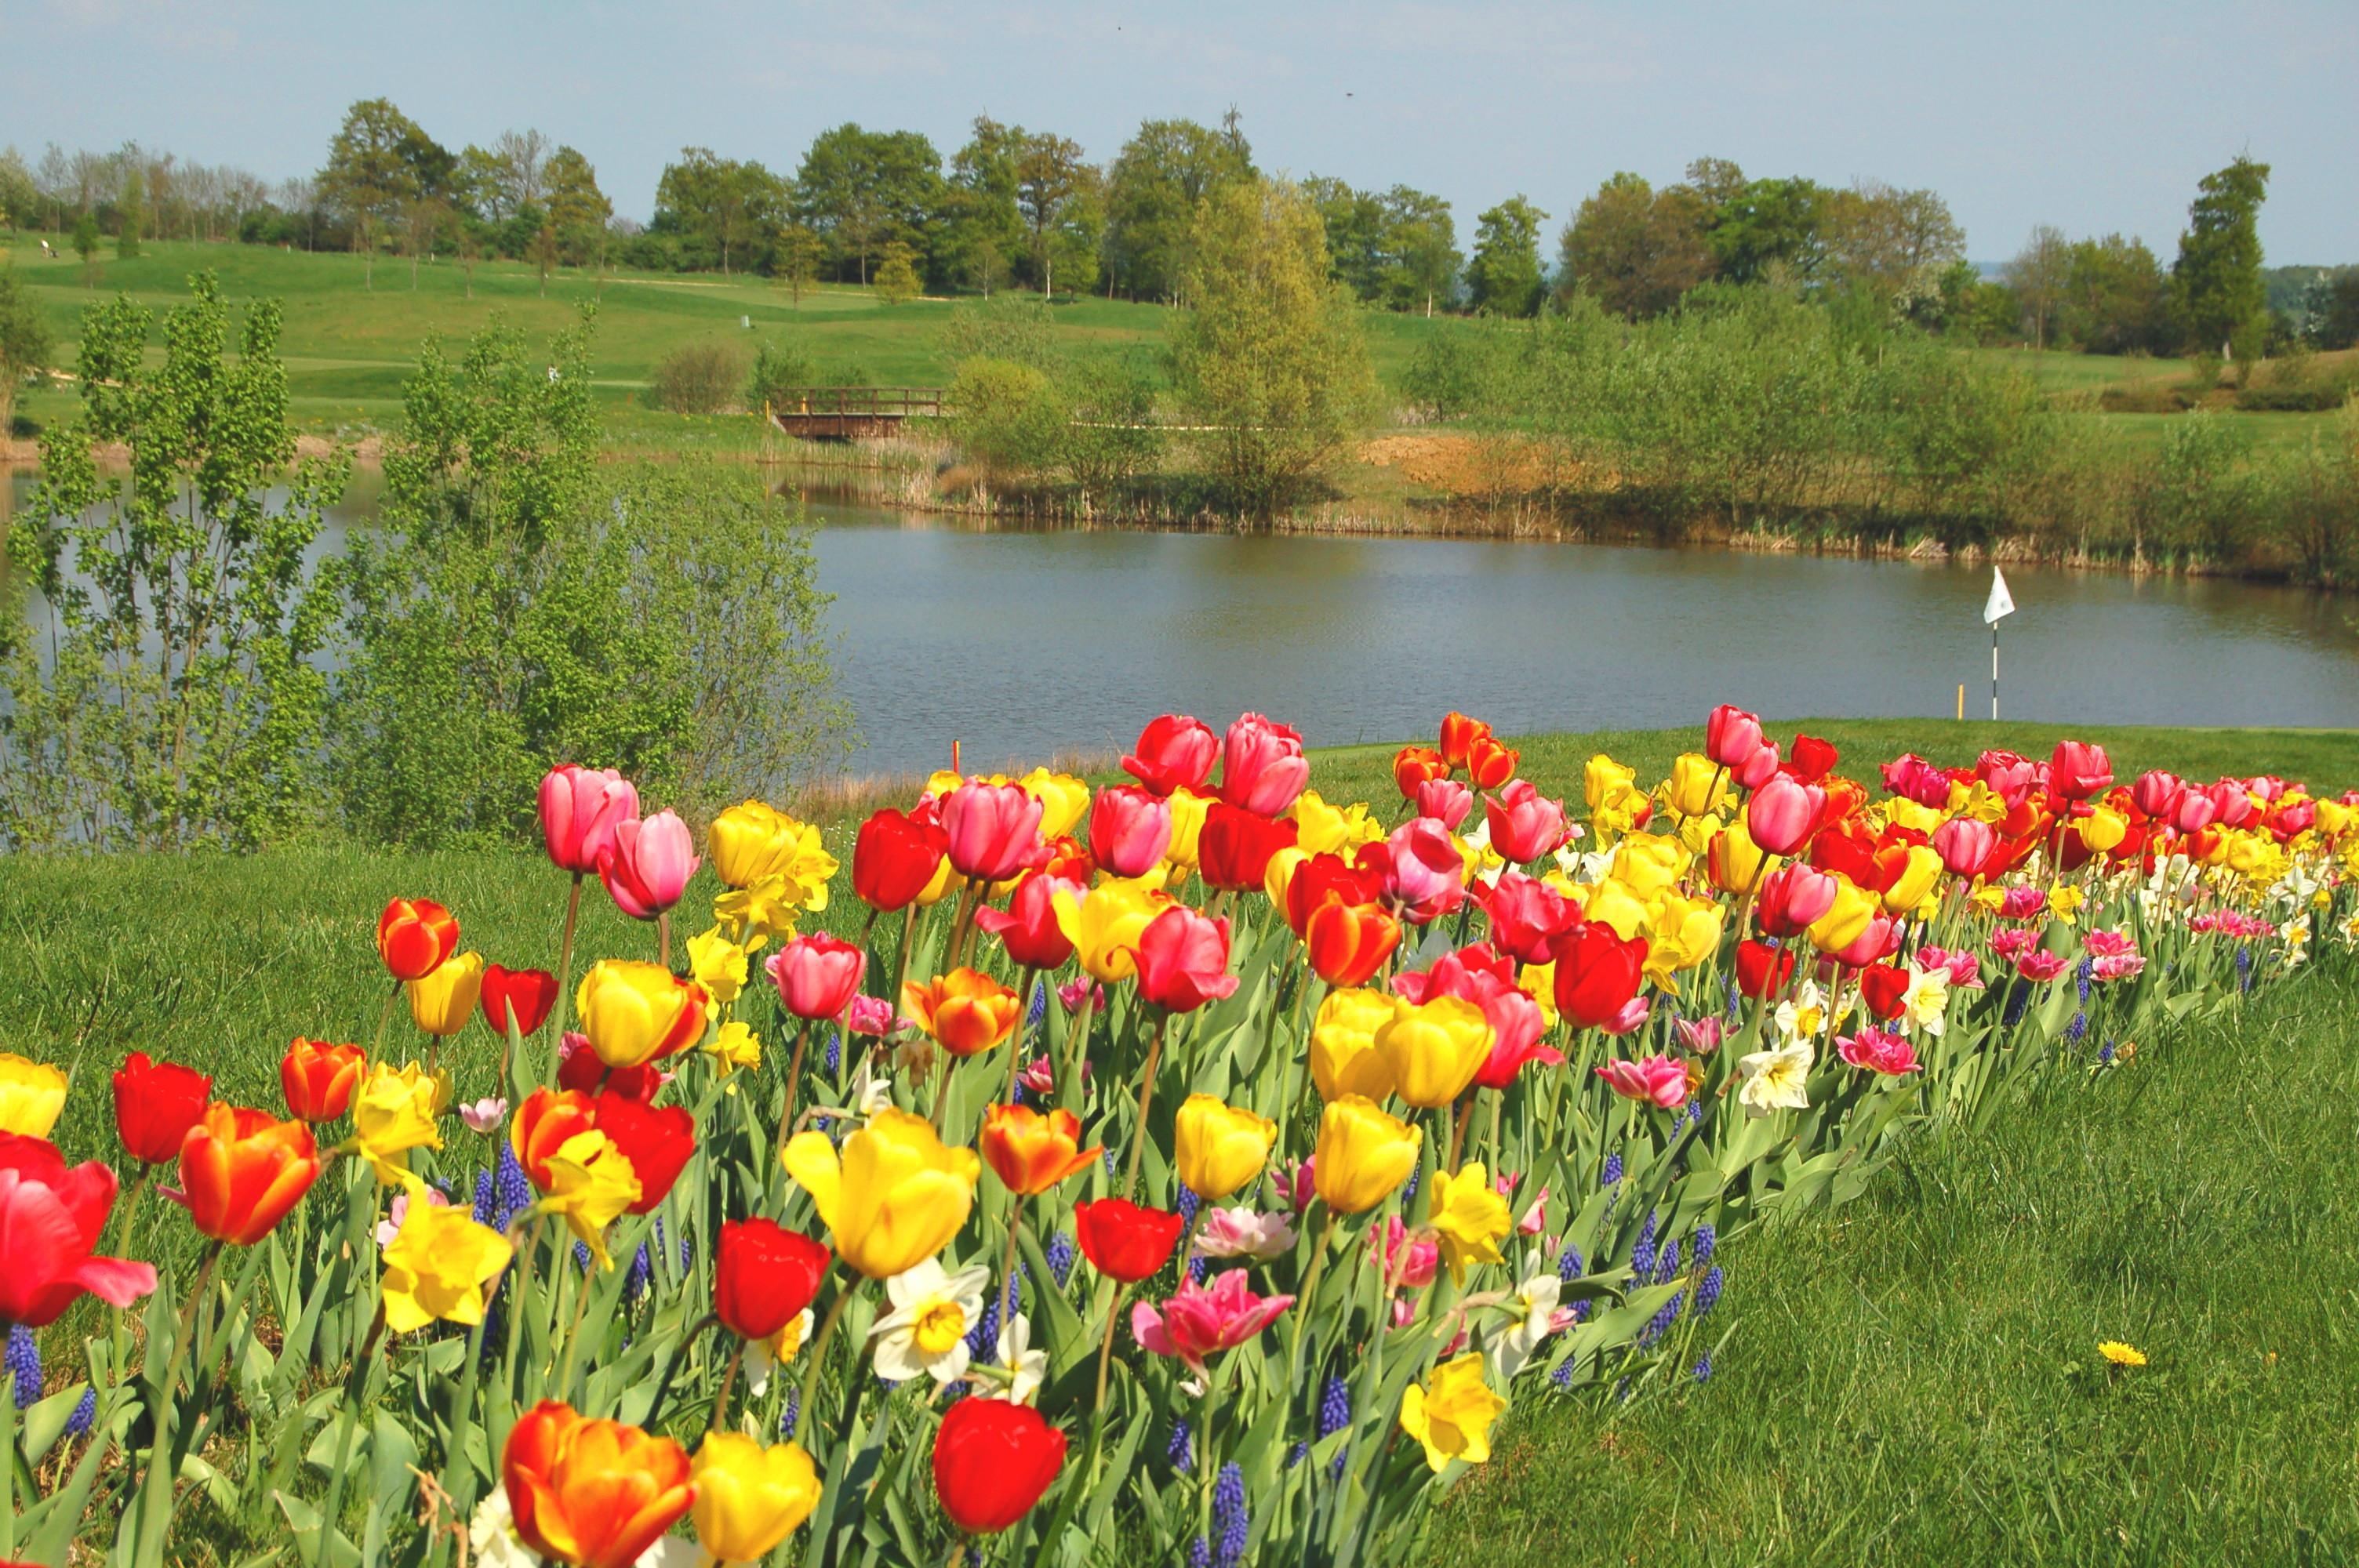 File Preisch met tulpen JPG   Wikimedia Commons